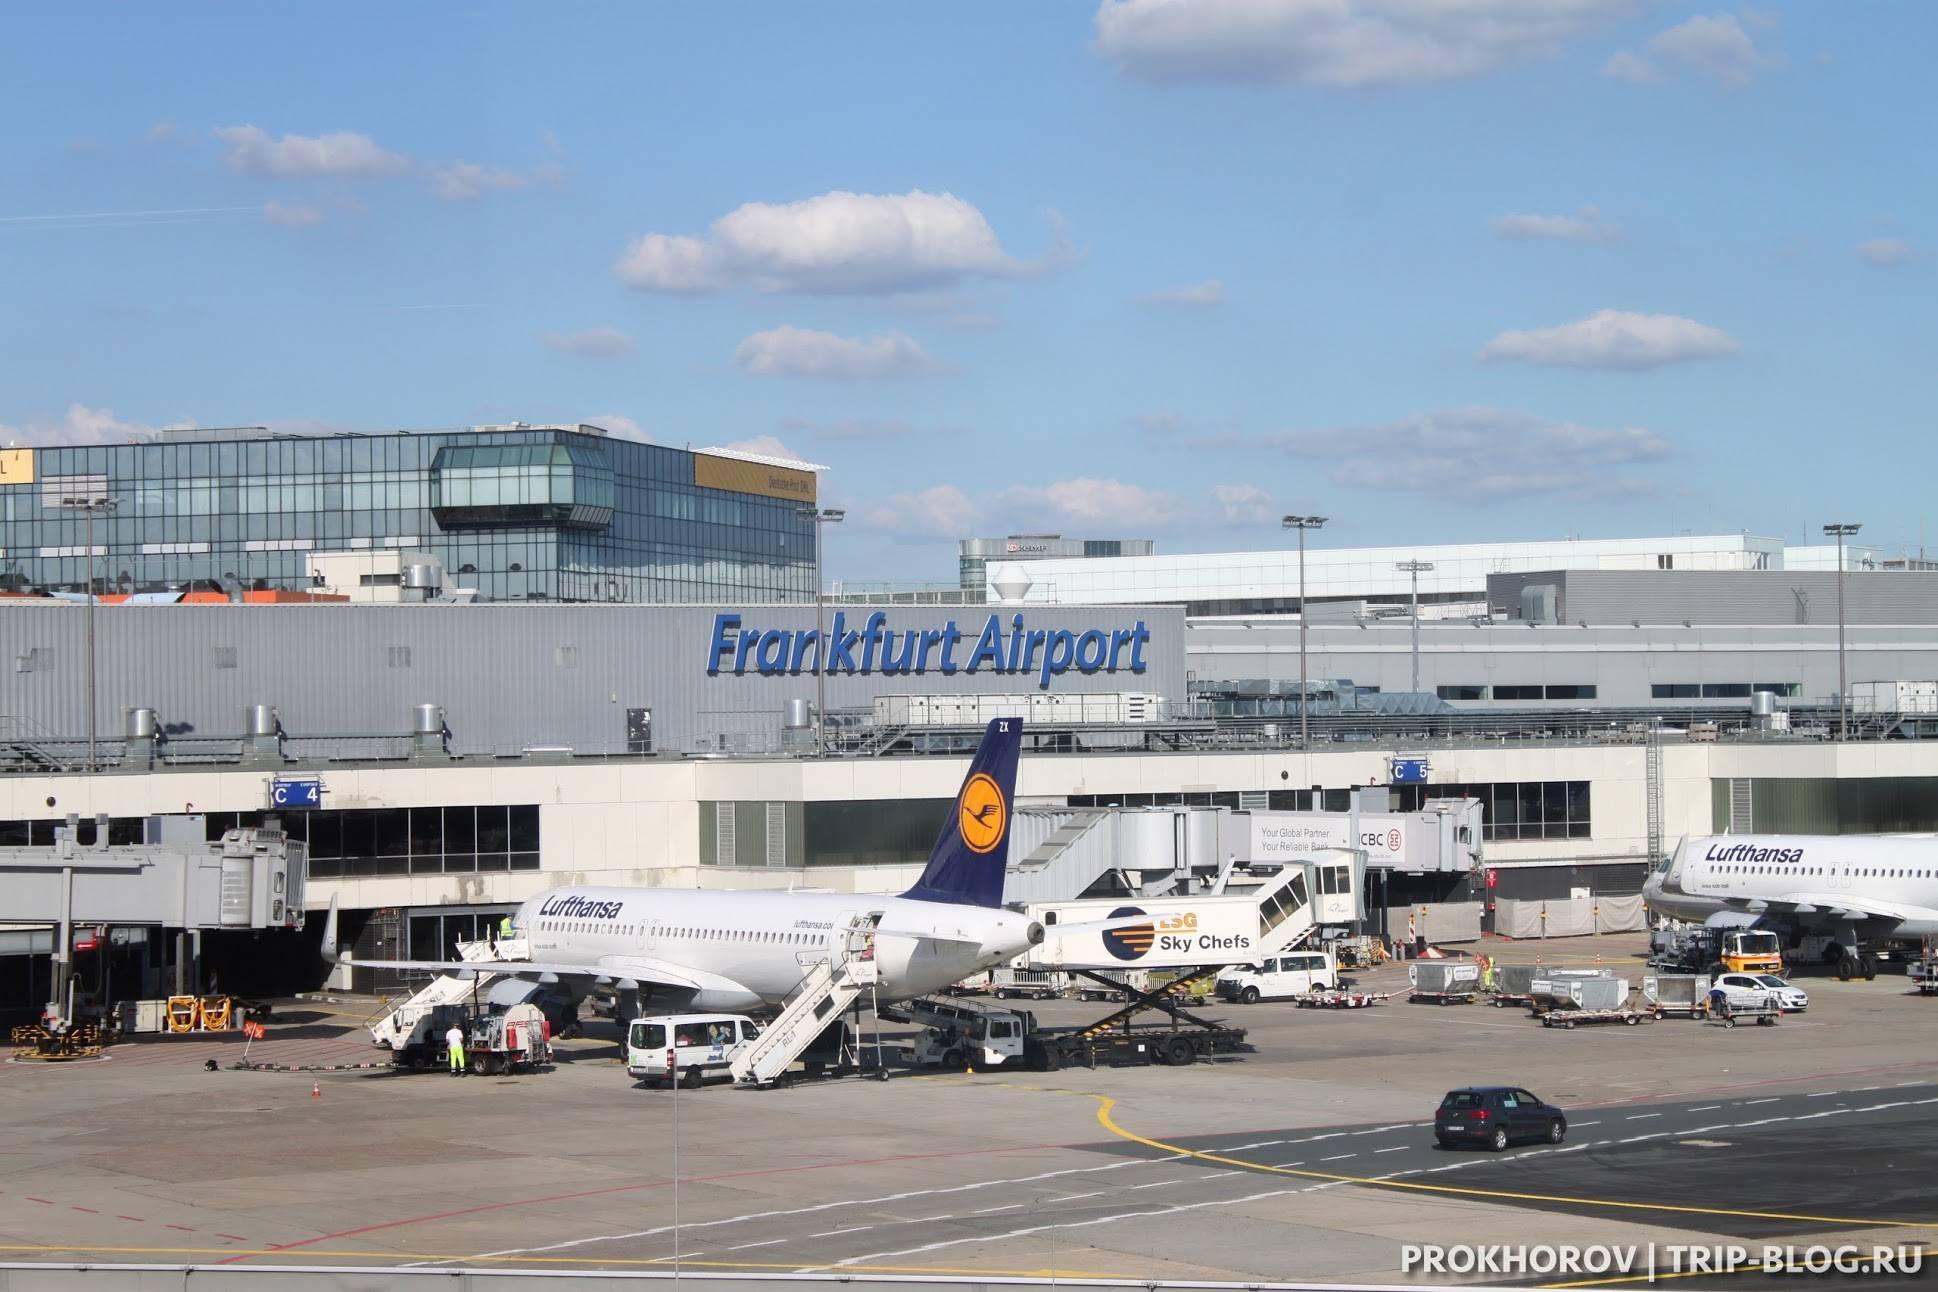 Путеводитель по аэропорту франкфурта